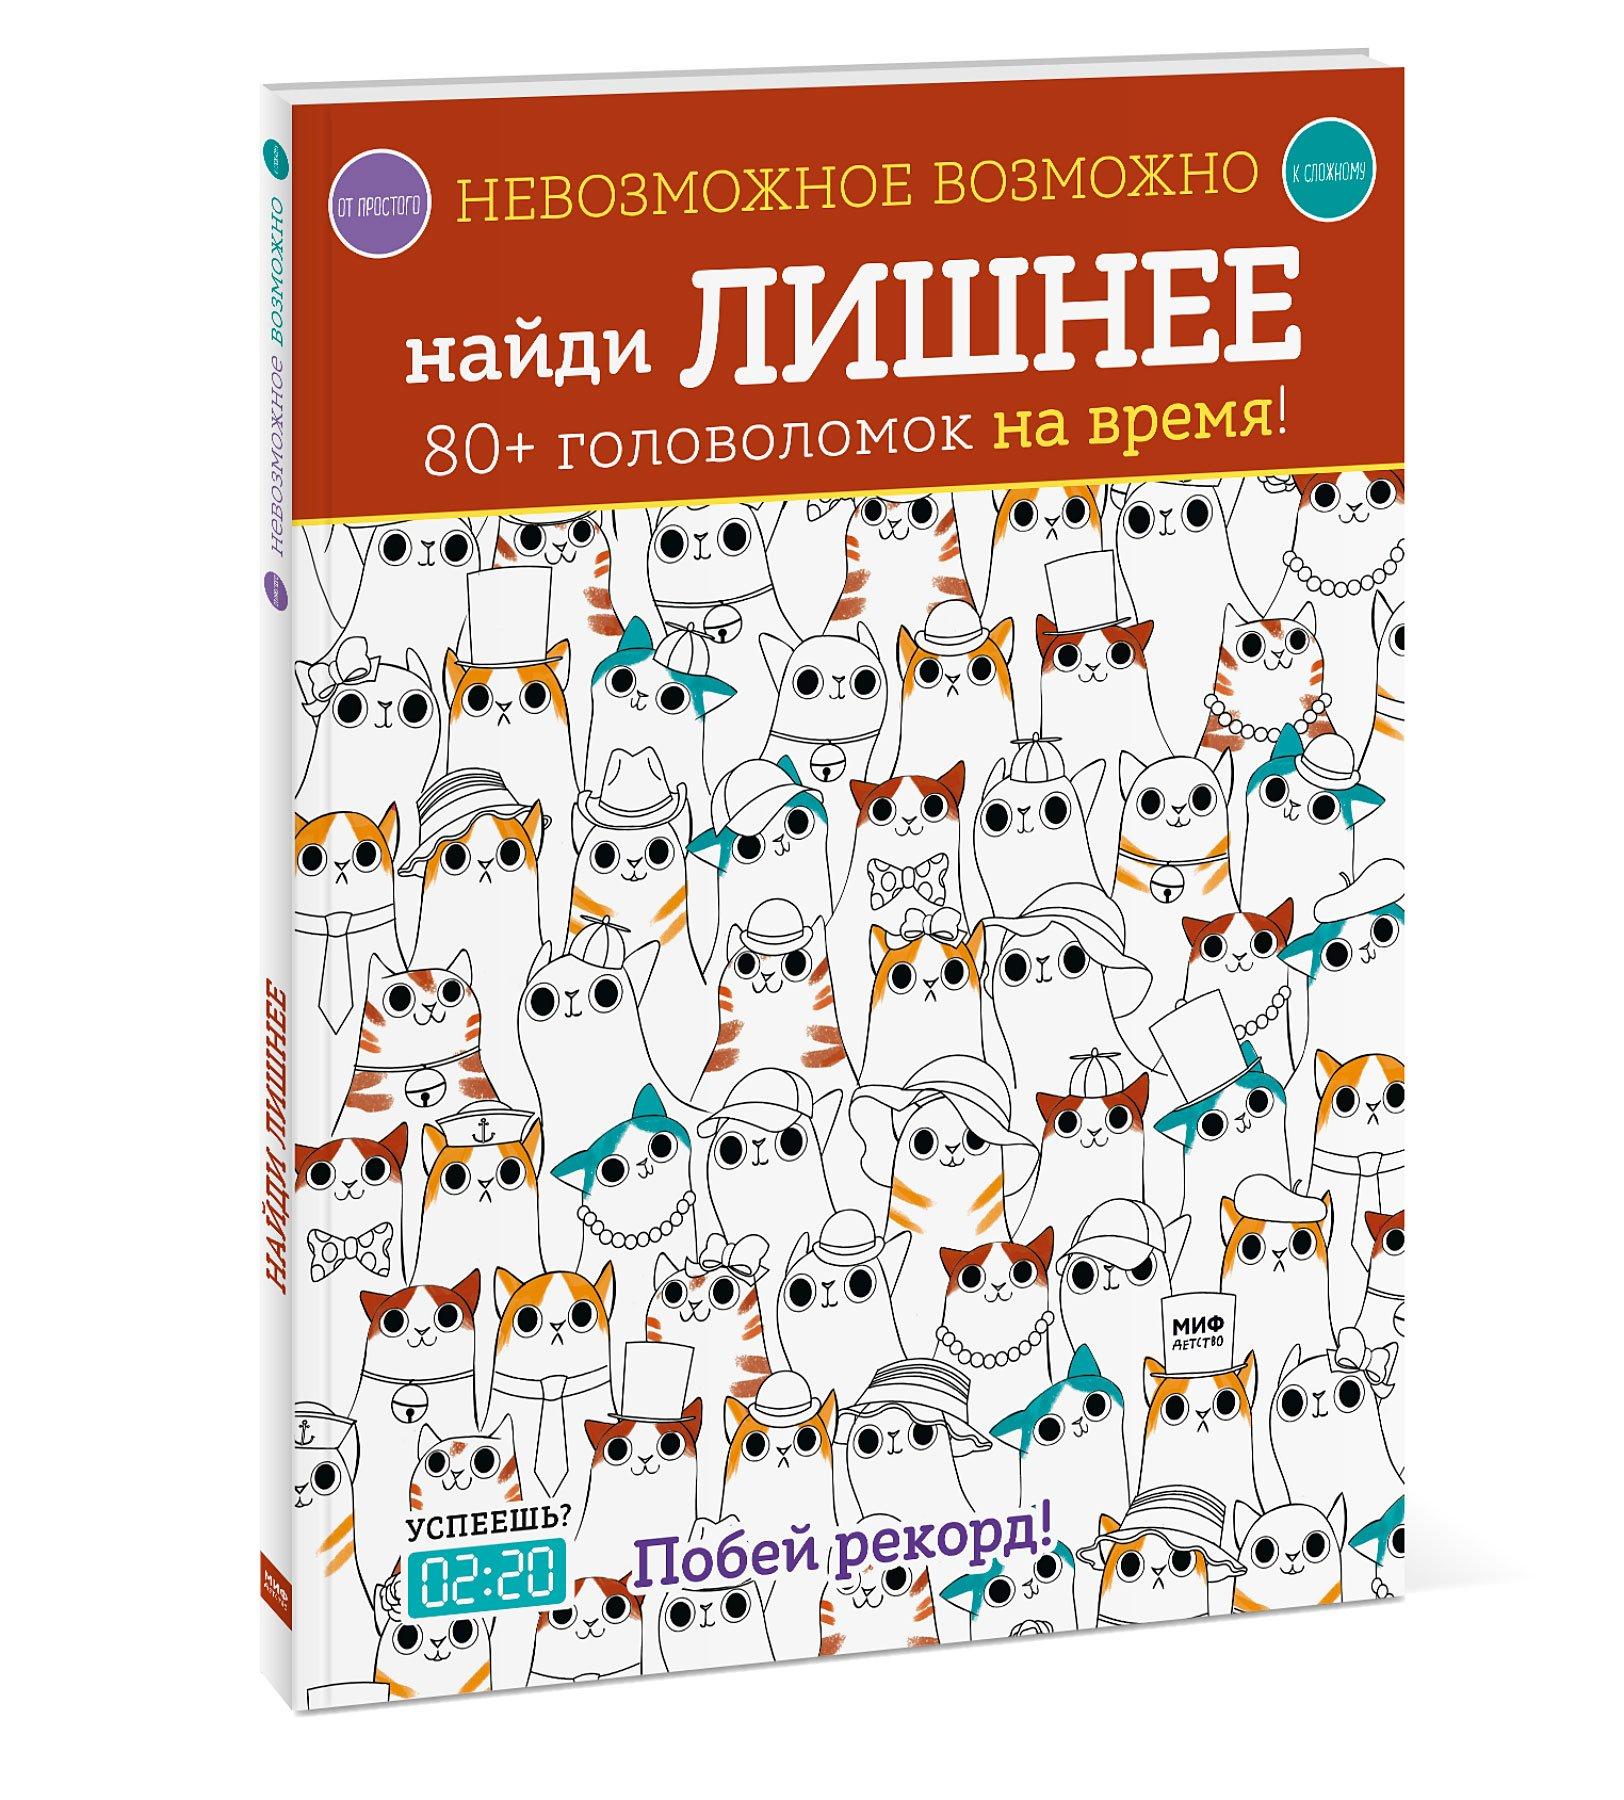 сергей разуваев до последнего квадратного метра Сергей Разуваев Невозможное возможно. Найди лишнее